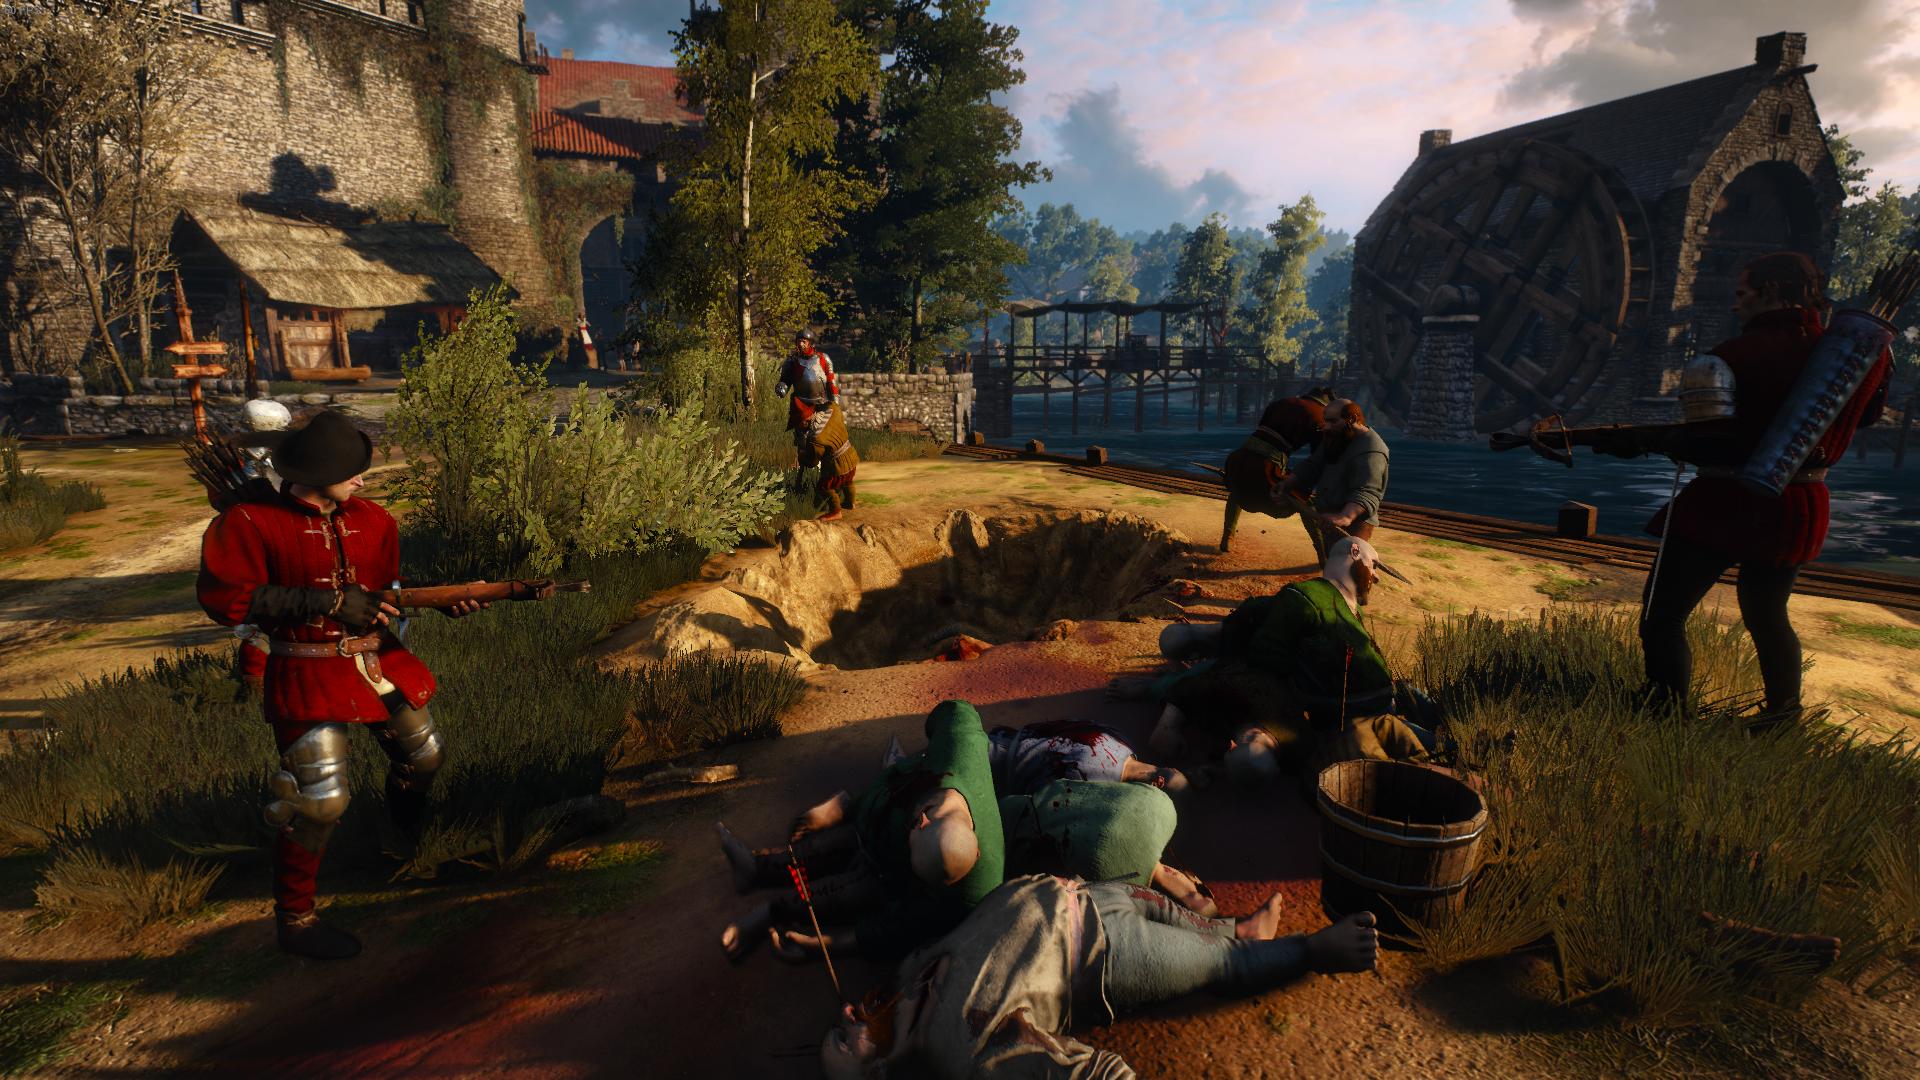 Nov - Witcher 3: Wild Hunt, the